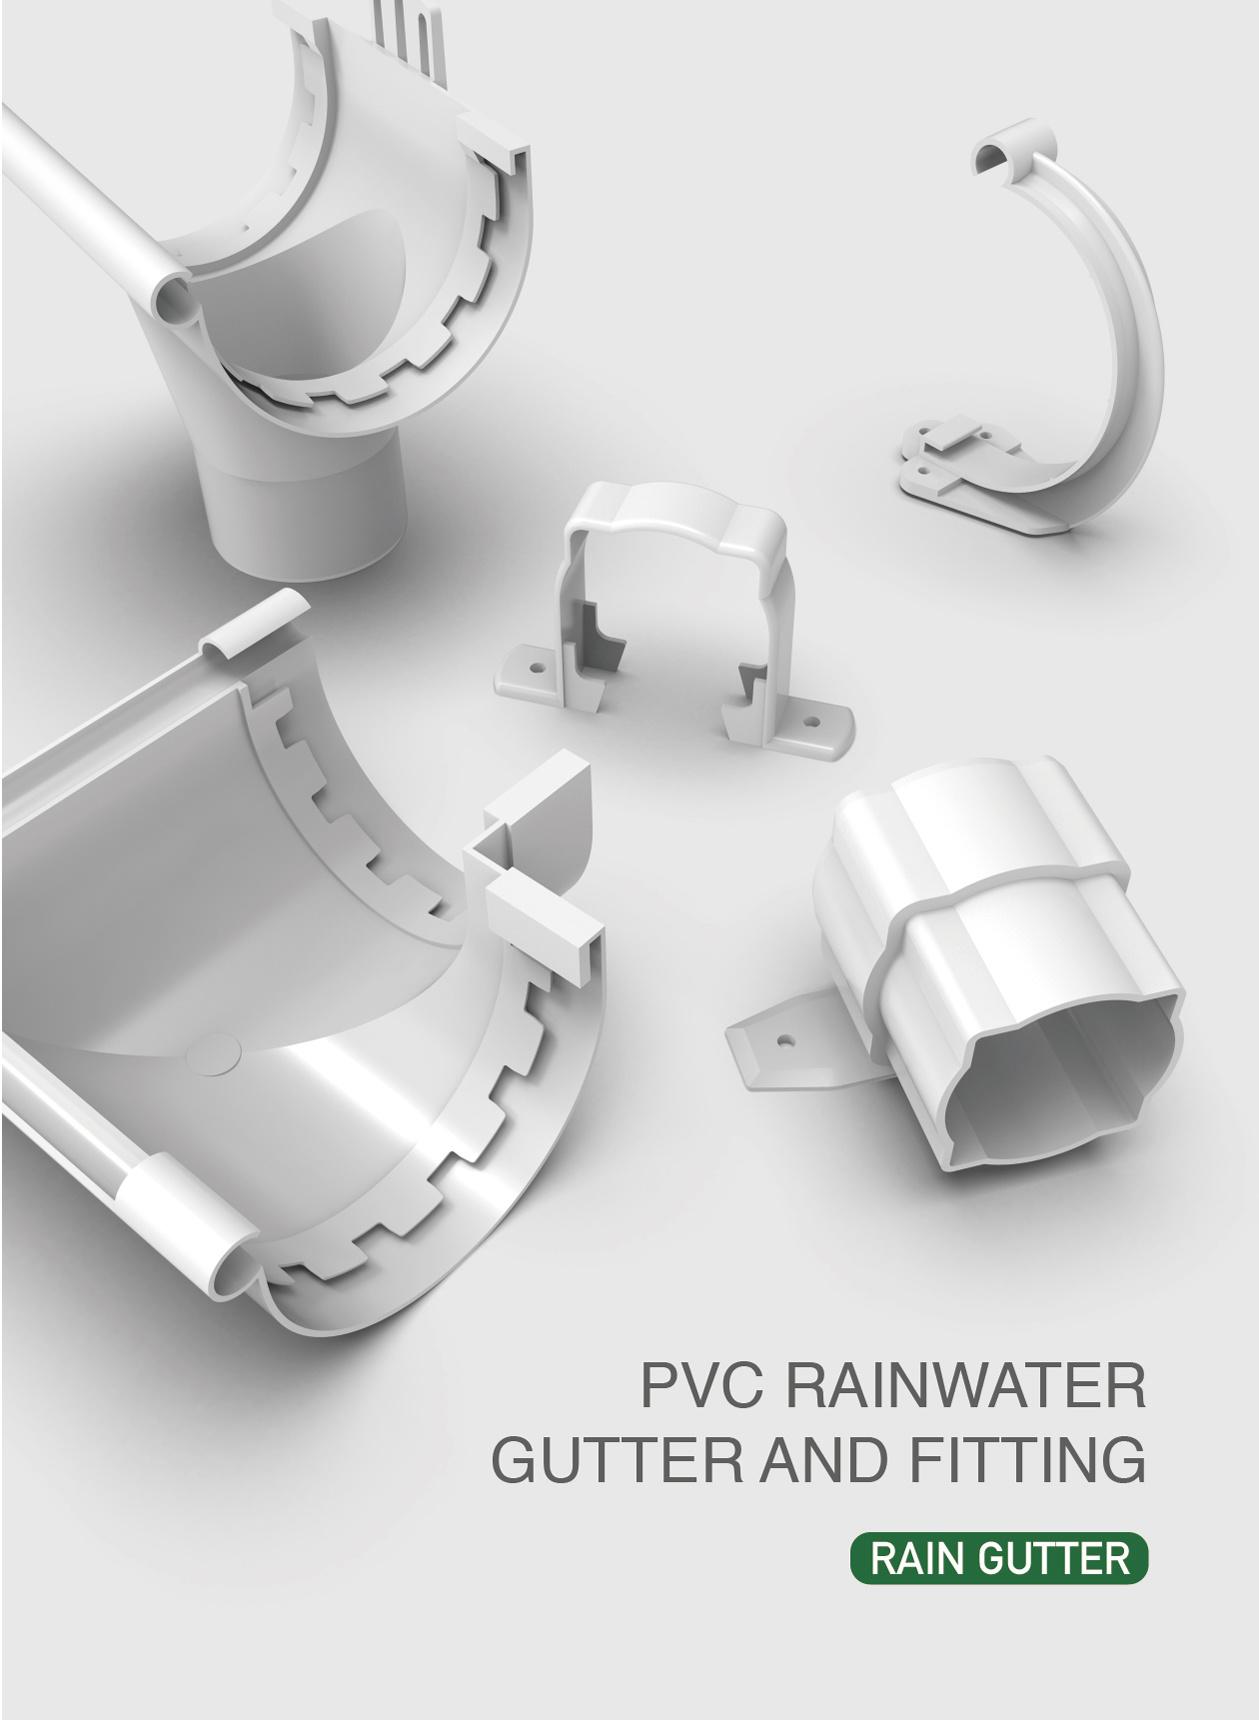 China Era Piping Systems Pvc Rain Gutter And Fittings Rain